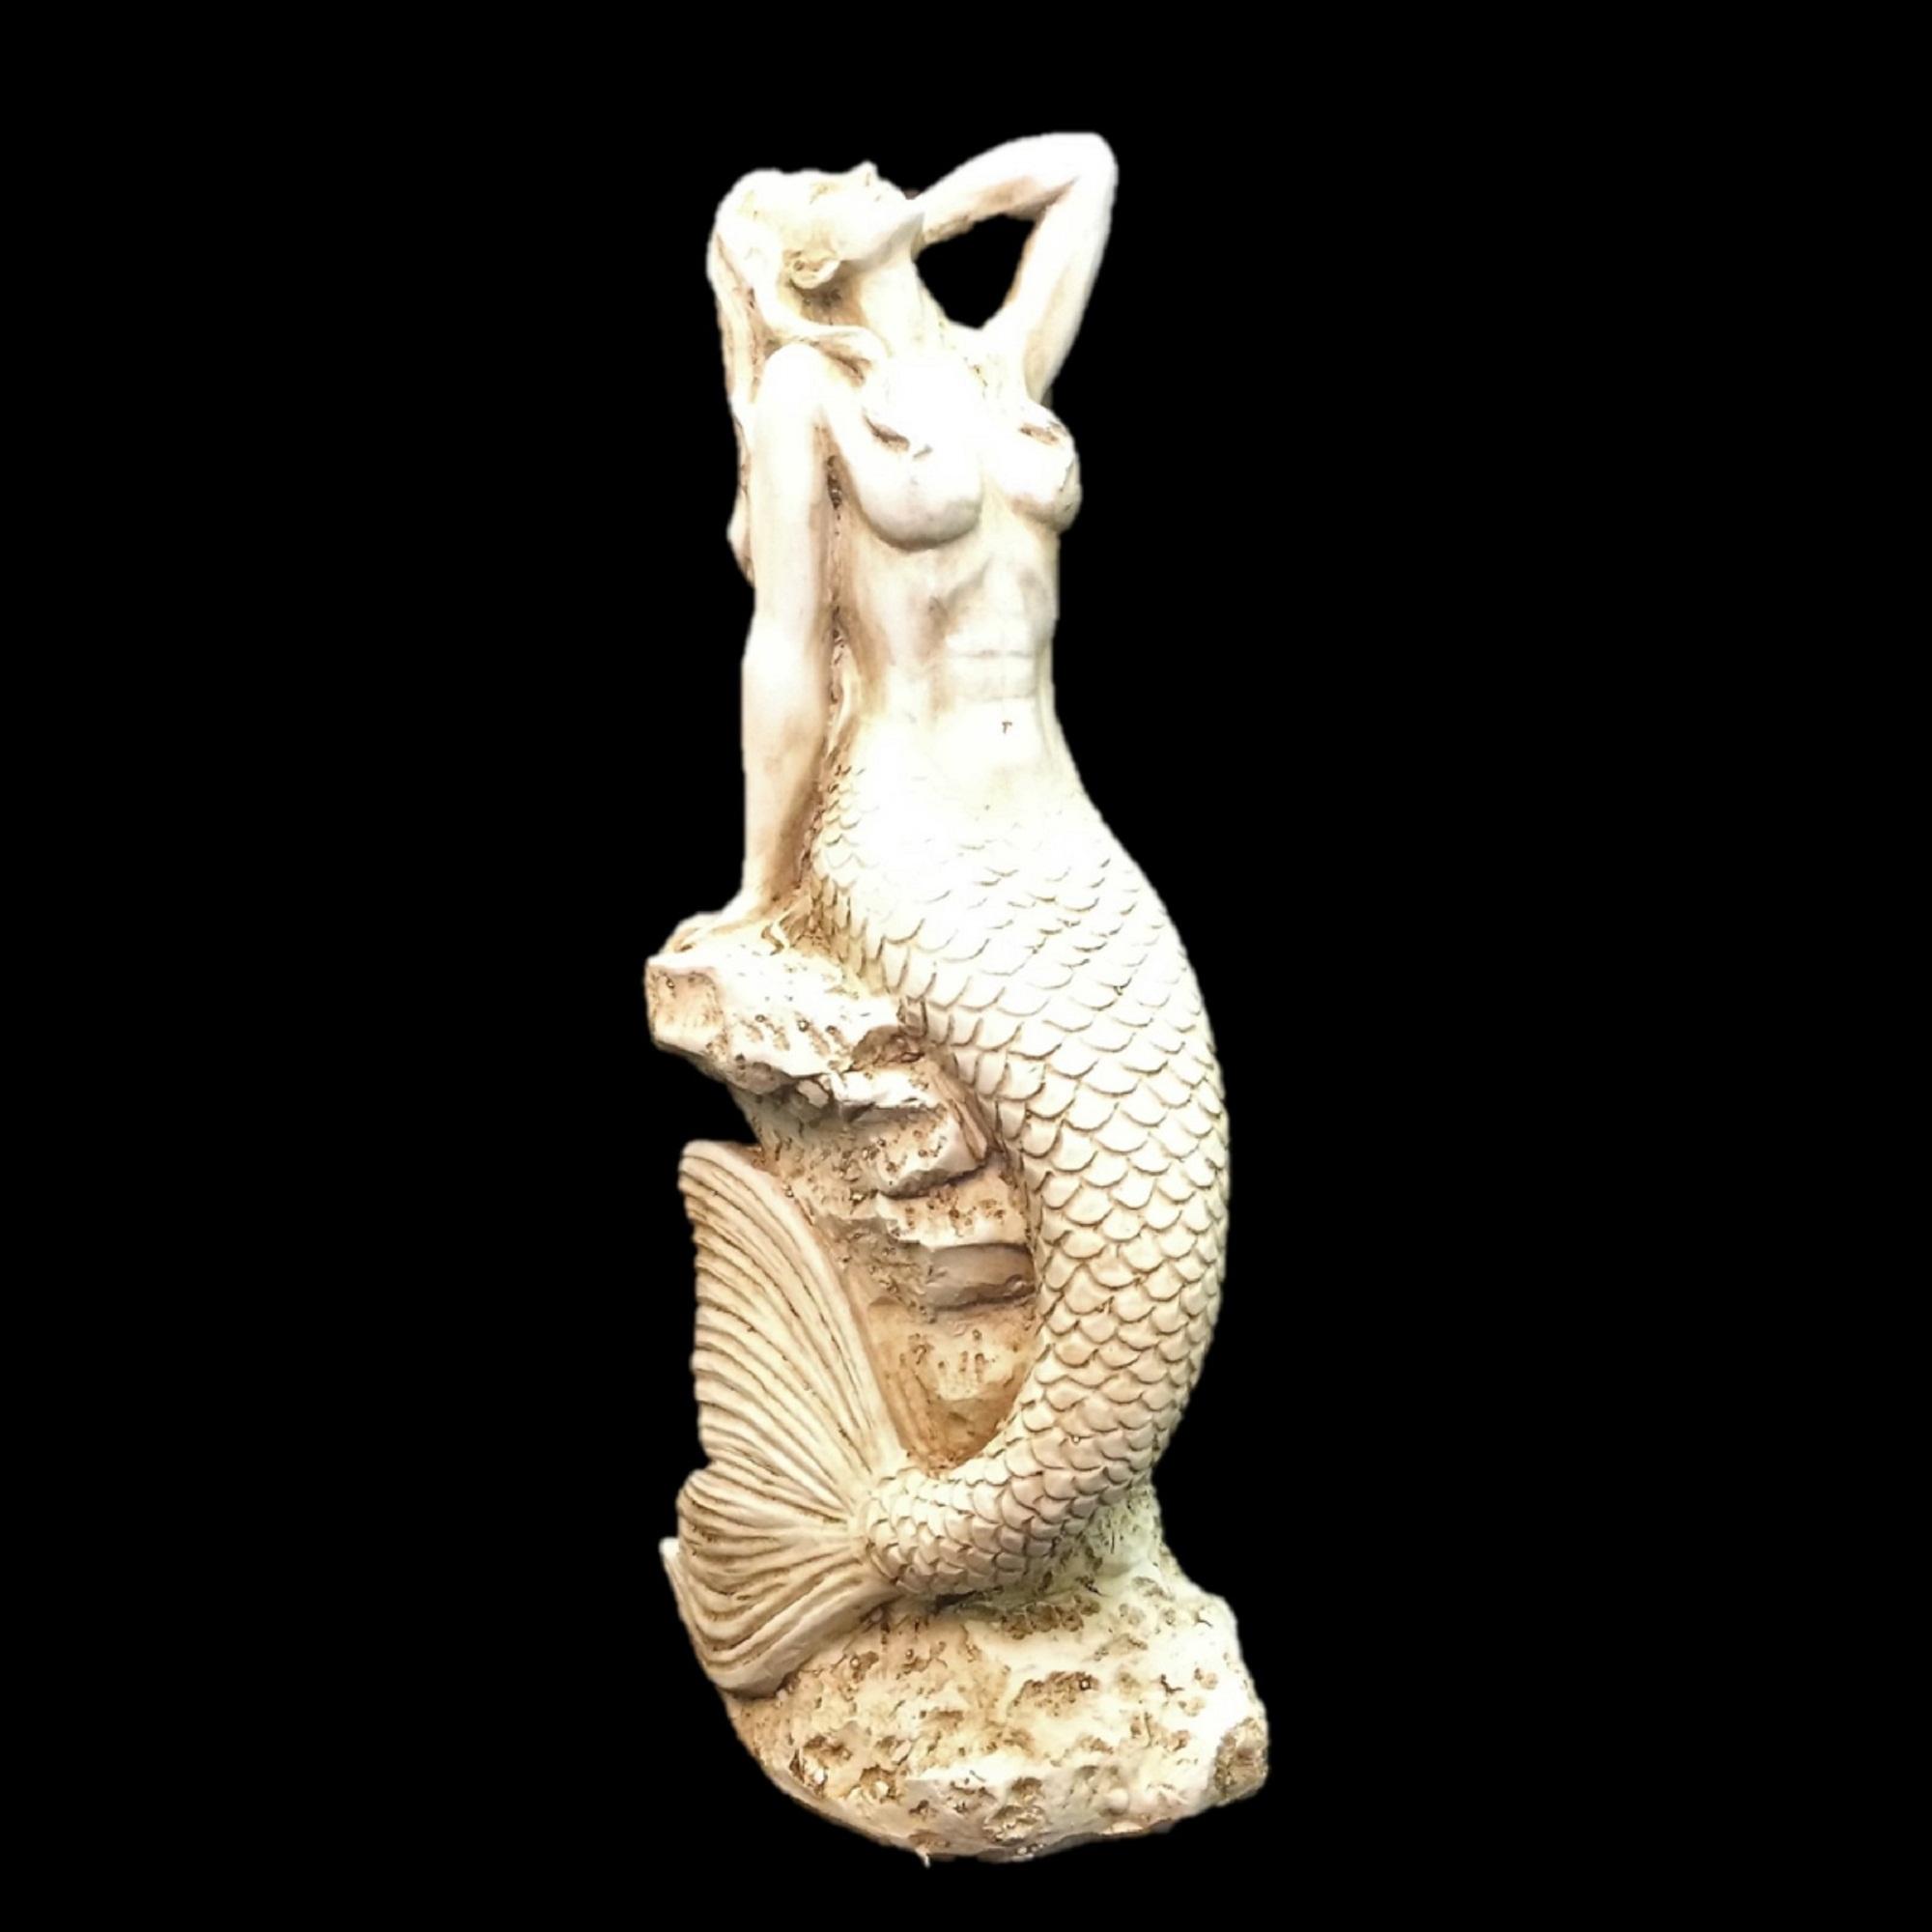 Homestyles 20 in. Antique White Sexy Mermaid Sitting on Coastal Rock Beach Nautical Statue